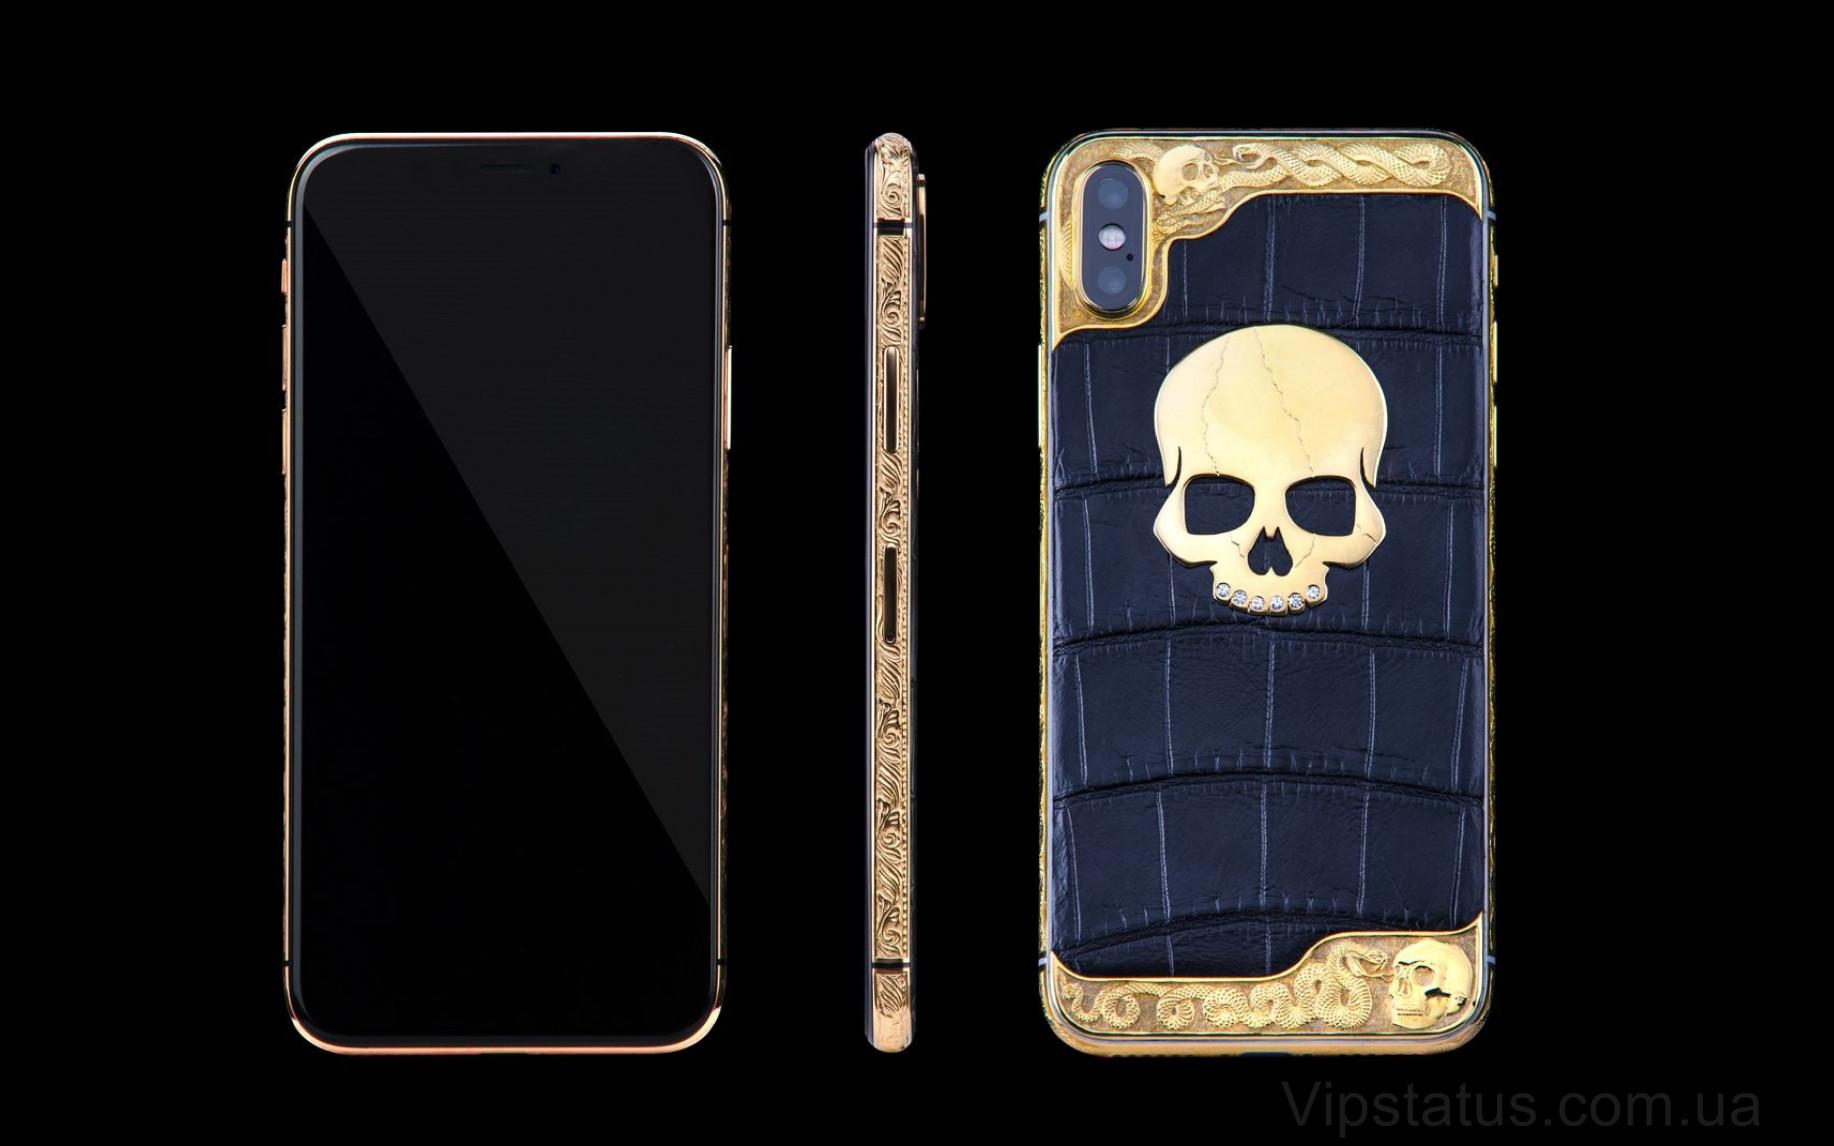 Elite Night Horror IPHONE XS 512 GB Night Horror IPHONE XS 512 GB image 8